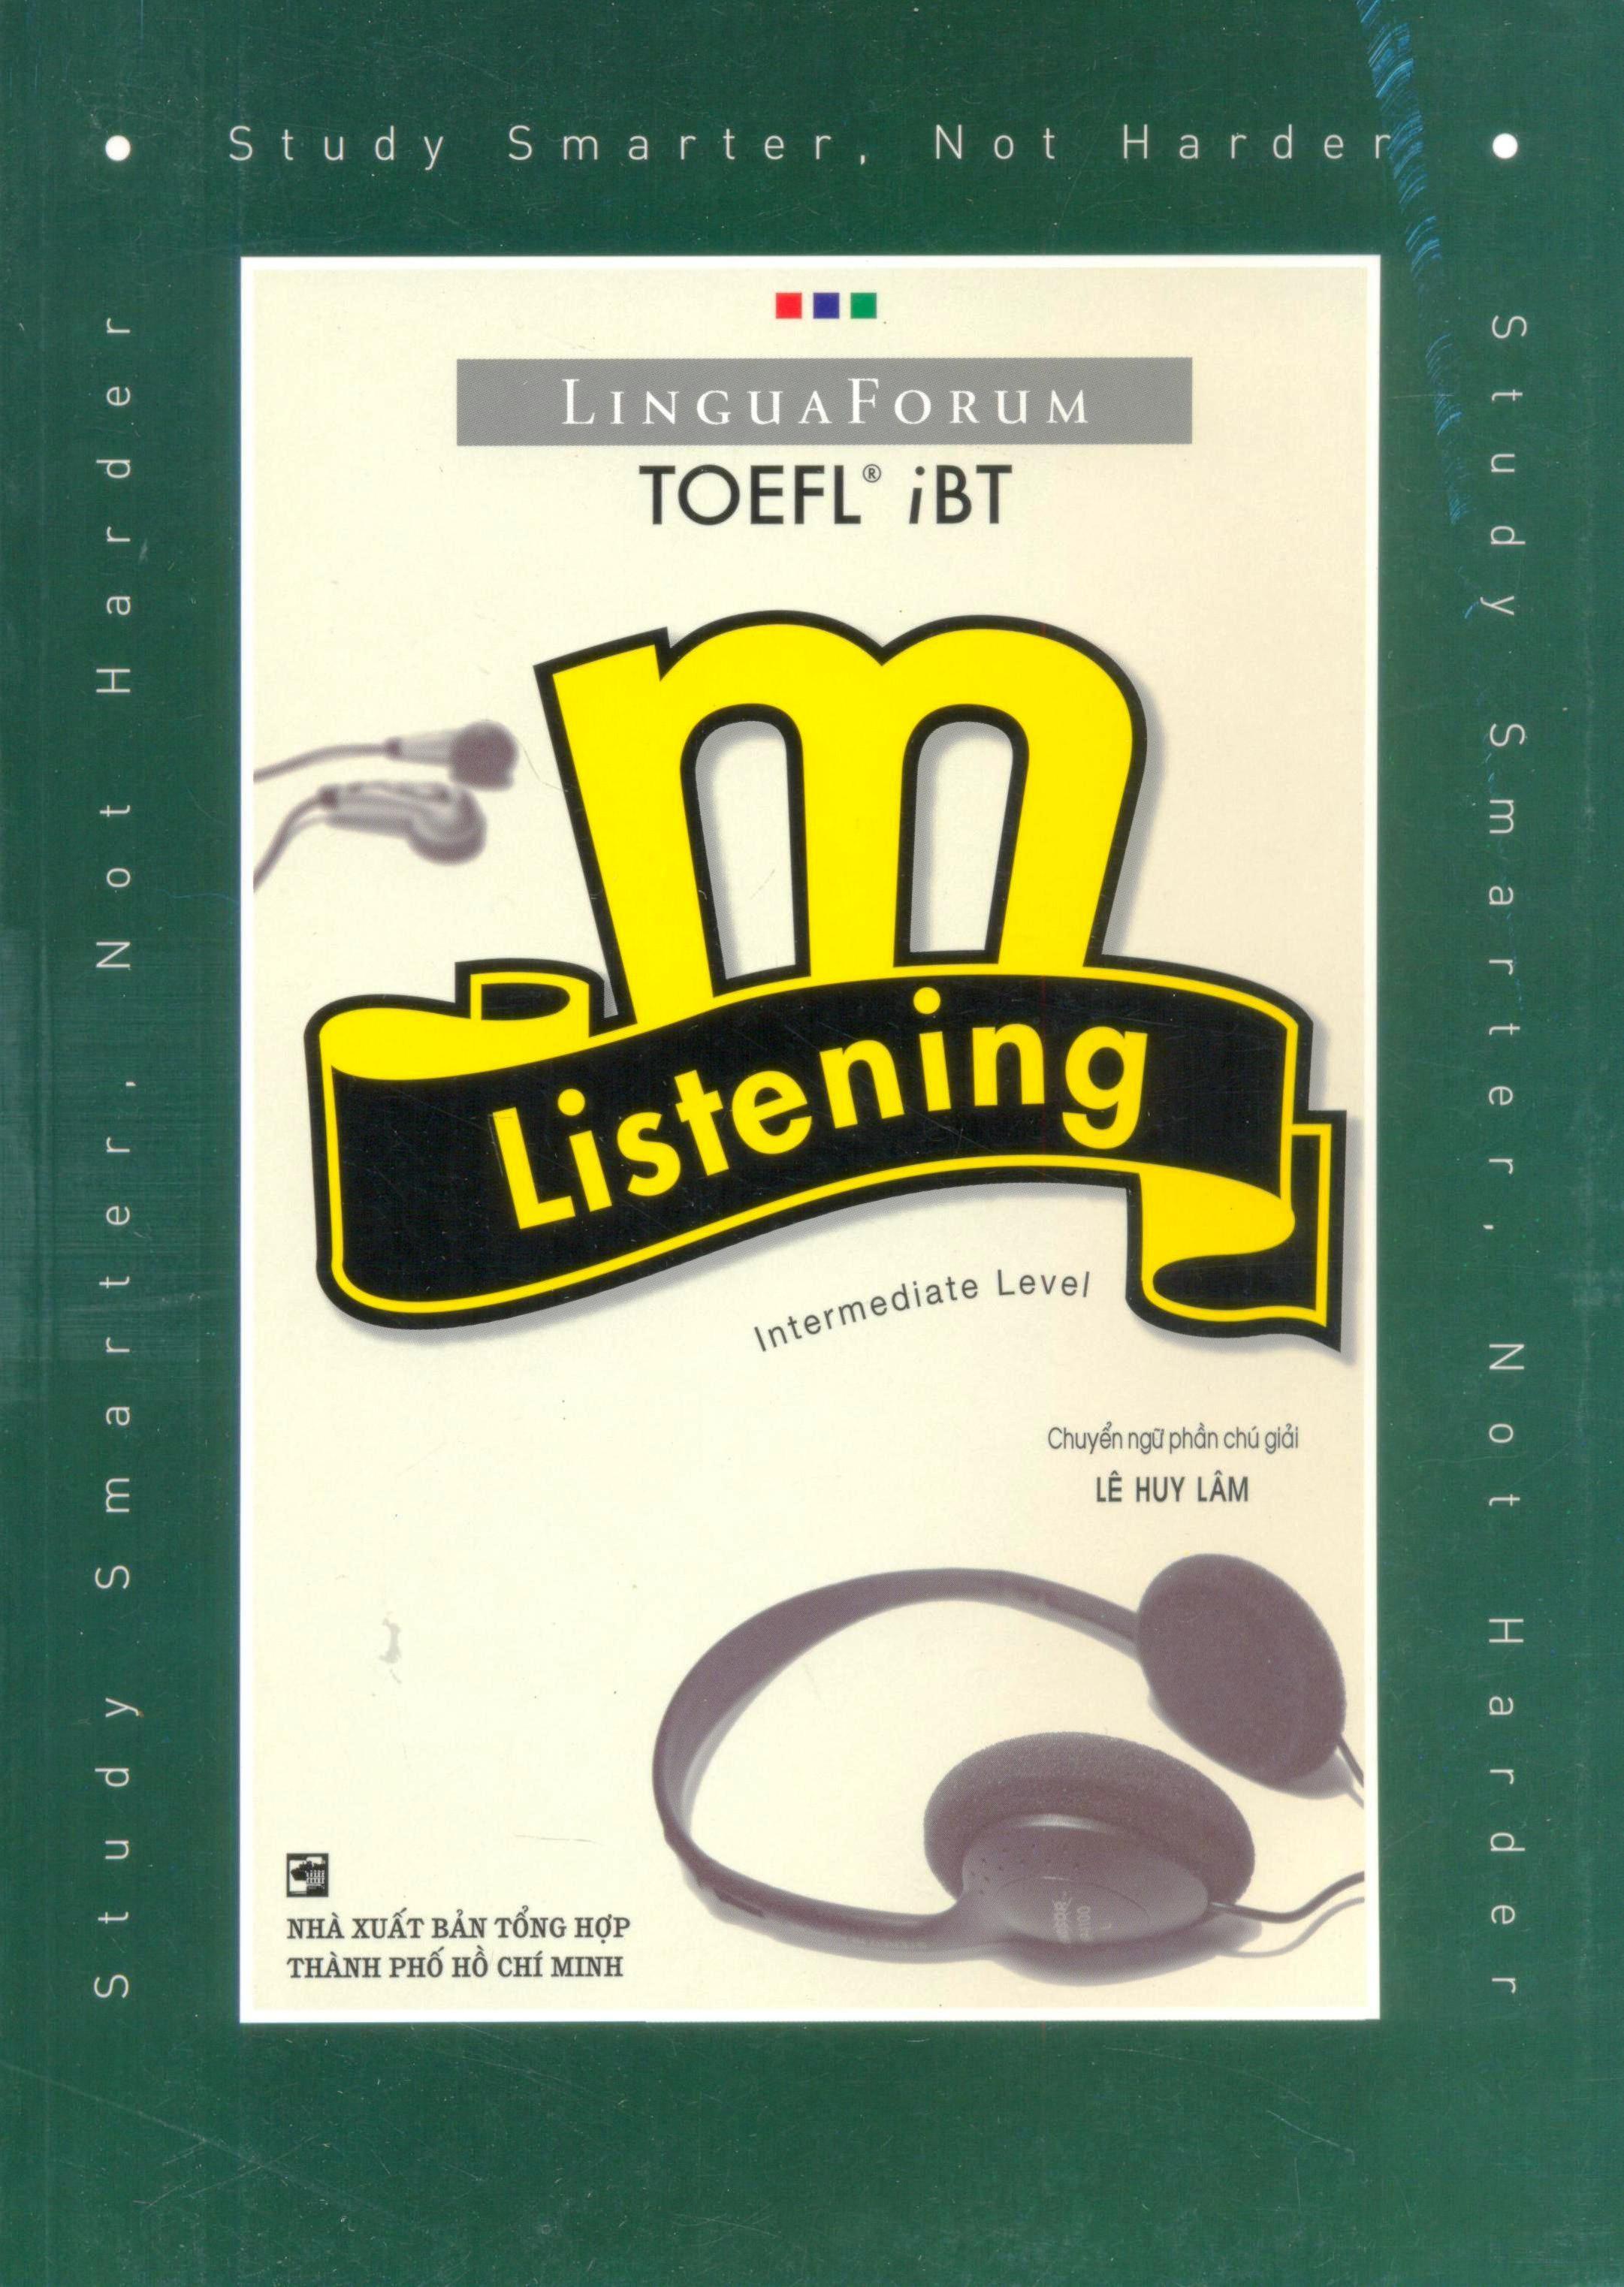 LinguaForum TOEFL iBT m - Listening Intermediate Level (Kèm 4 CD)